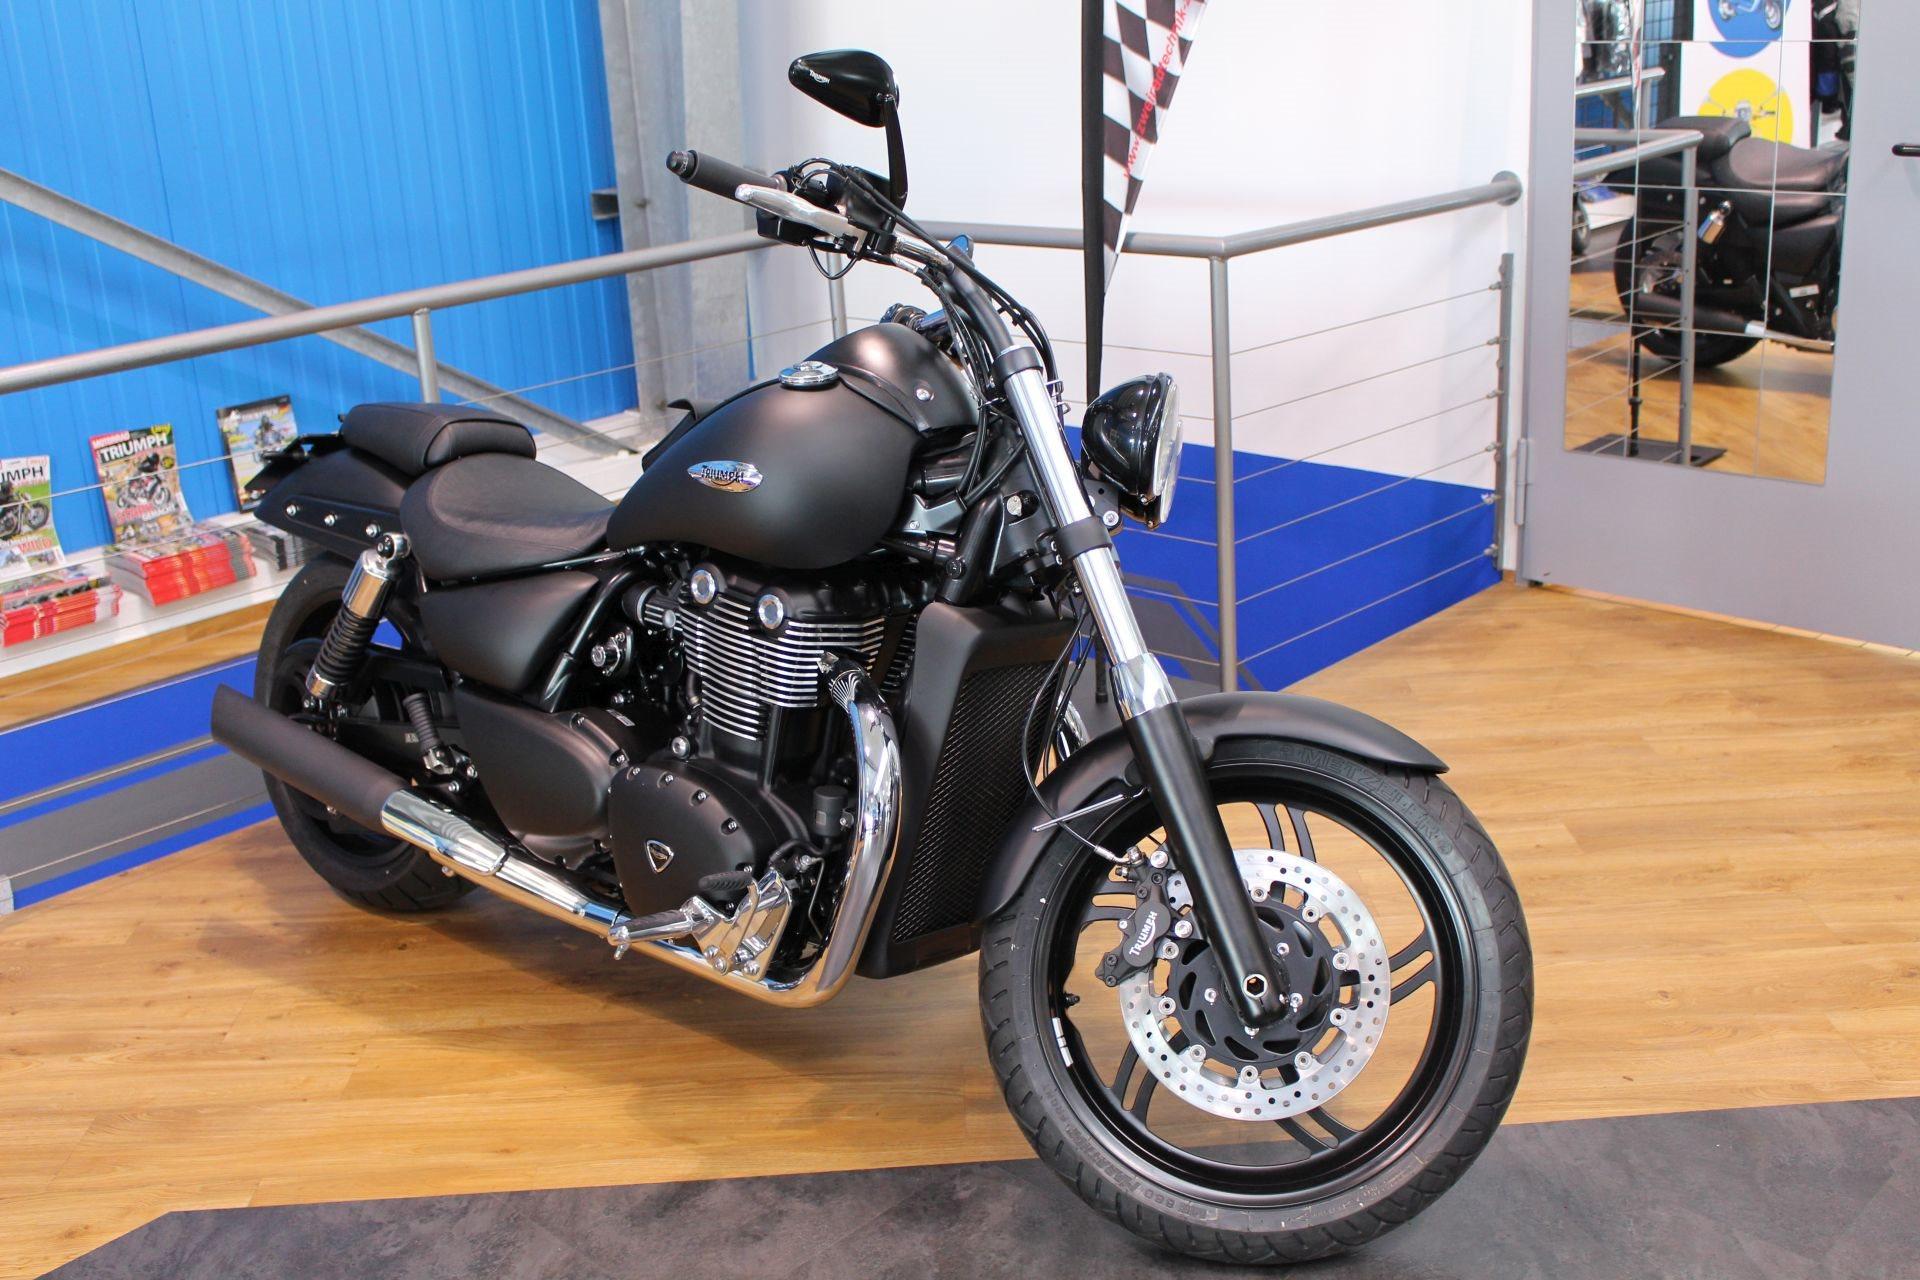 Details On The Custom Bike Triumph Thunderbird Storm Of Dealer